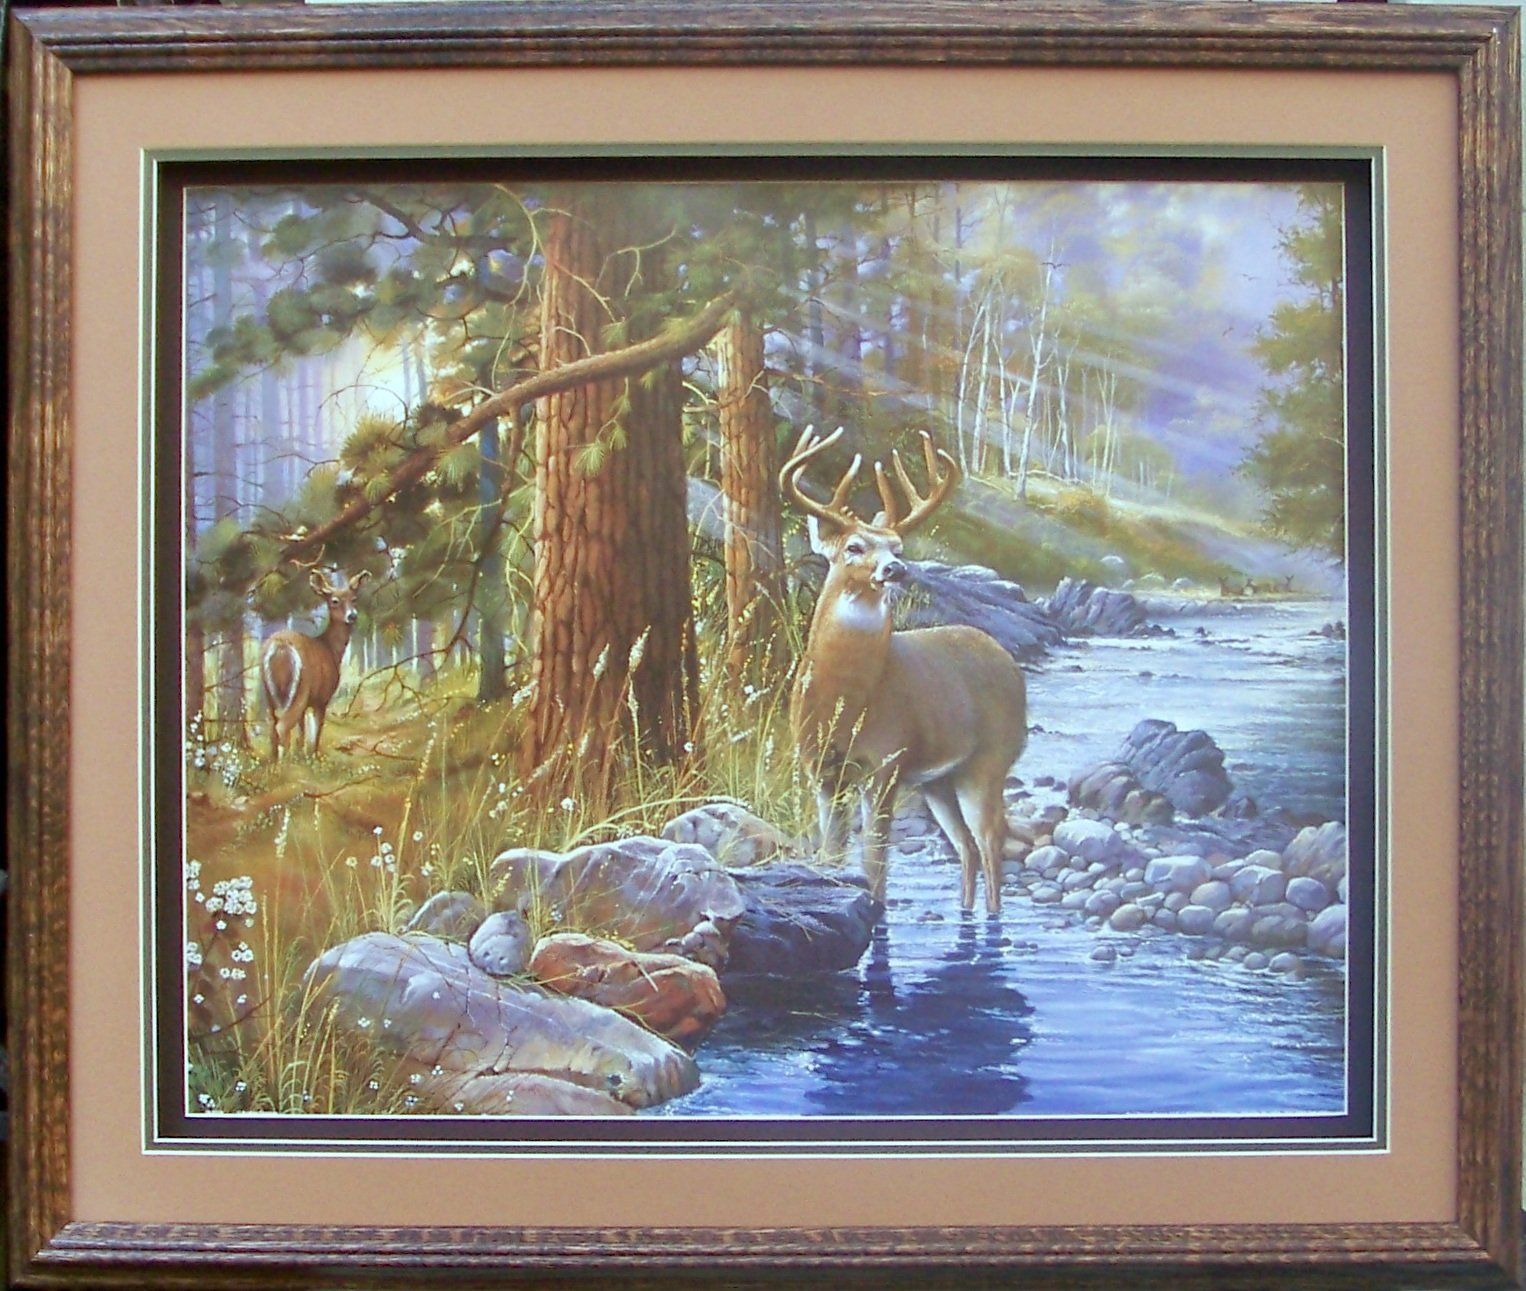 Deer in Woods Paper Tole 3D Decoupage Craft Kit Size 8x10 8-1019